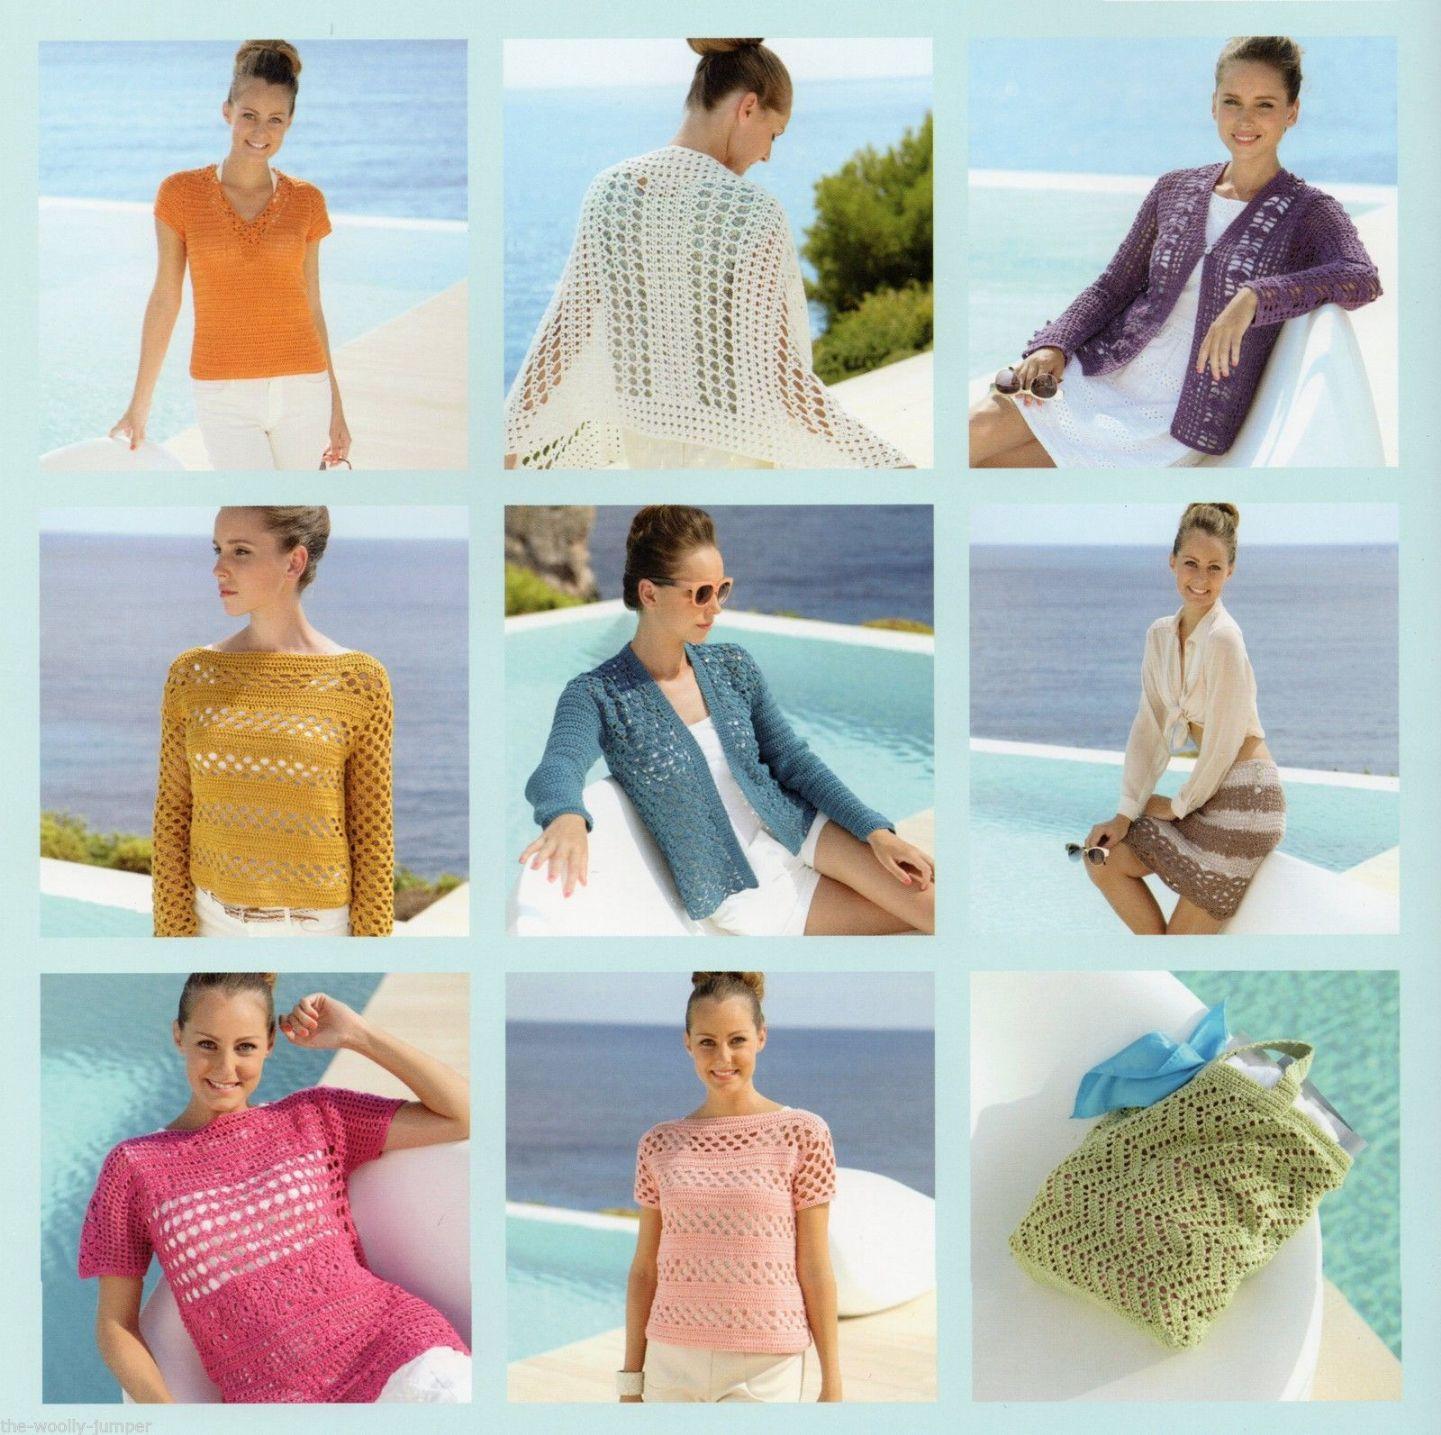 ee6db3f03 458-sirdar-cotton-dk -crochet-18-designs-crochet-booklet-for-women-51193-p.jpg